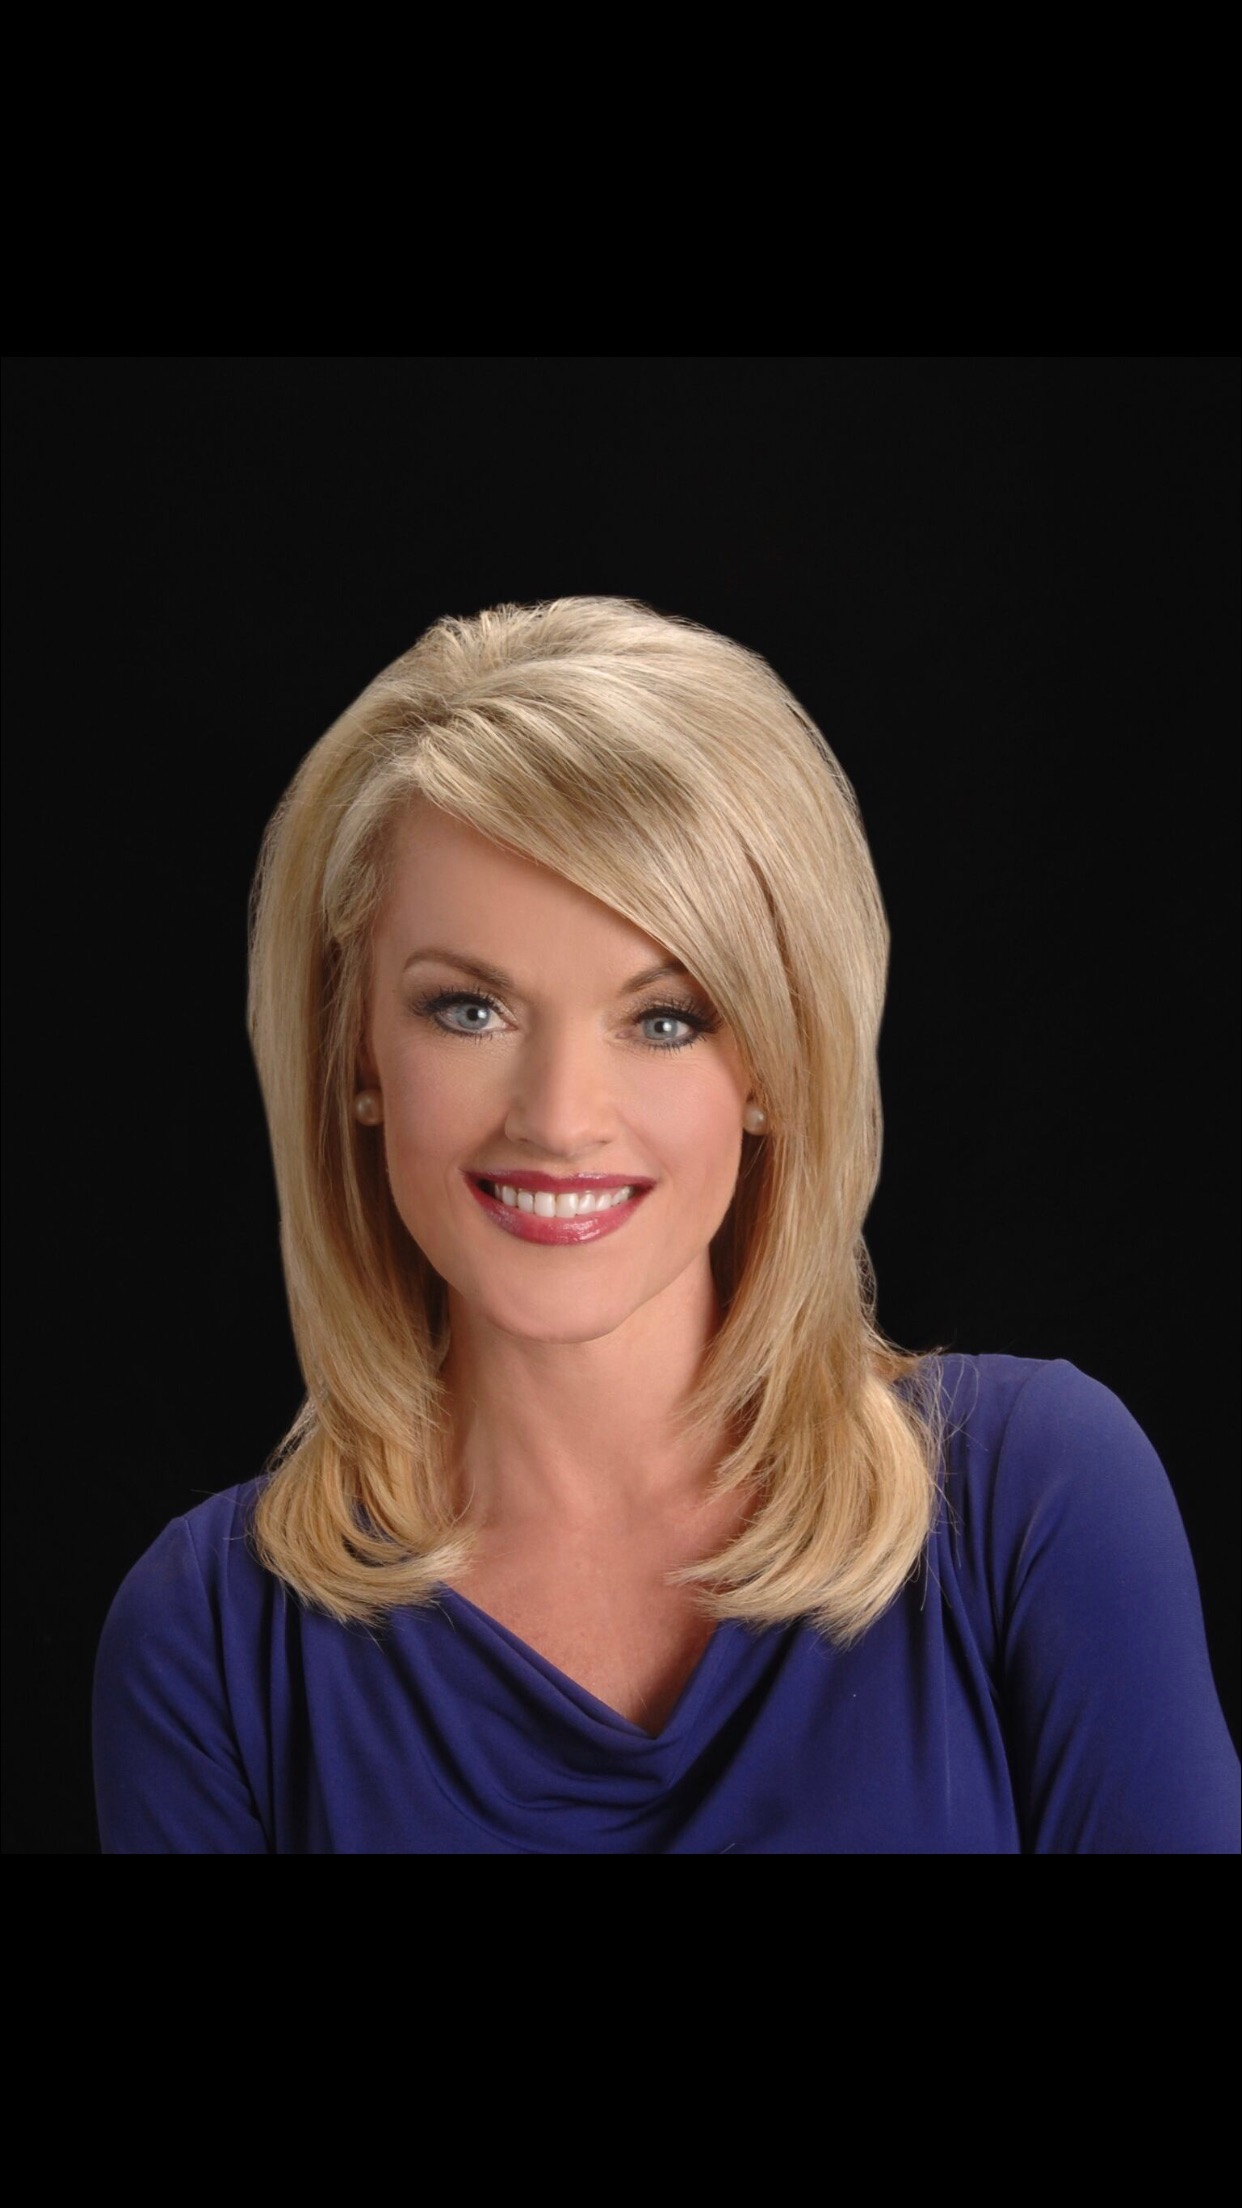 Jill Fraley Dotson